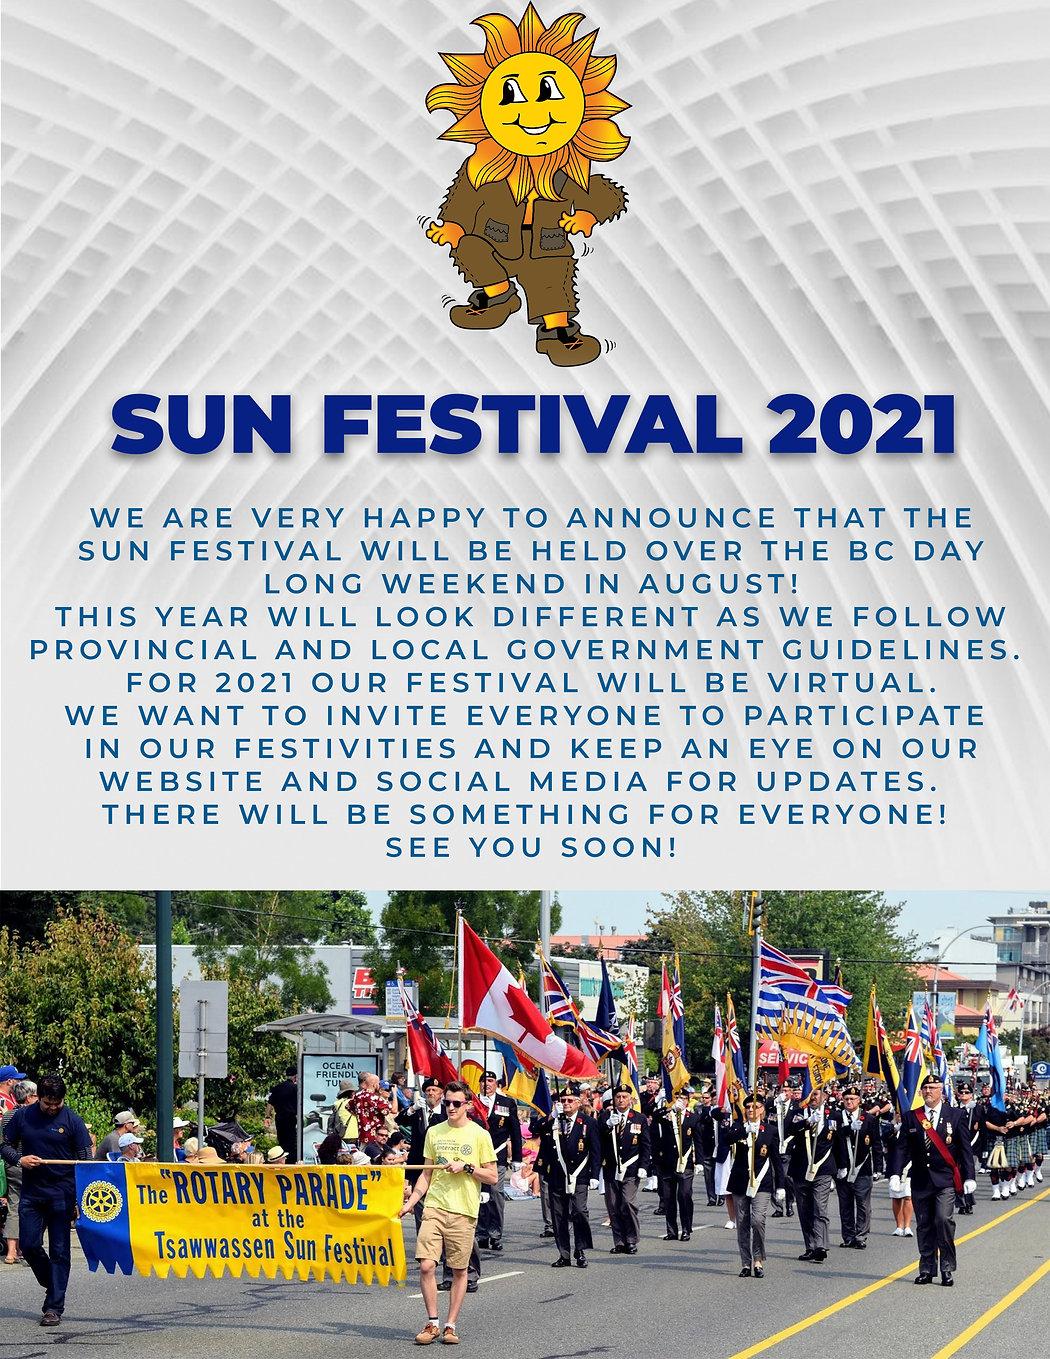 Sun Festival 2021.jpg